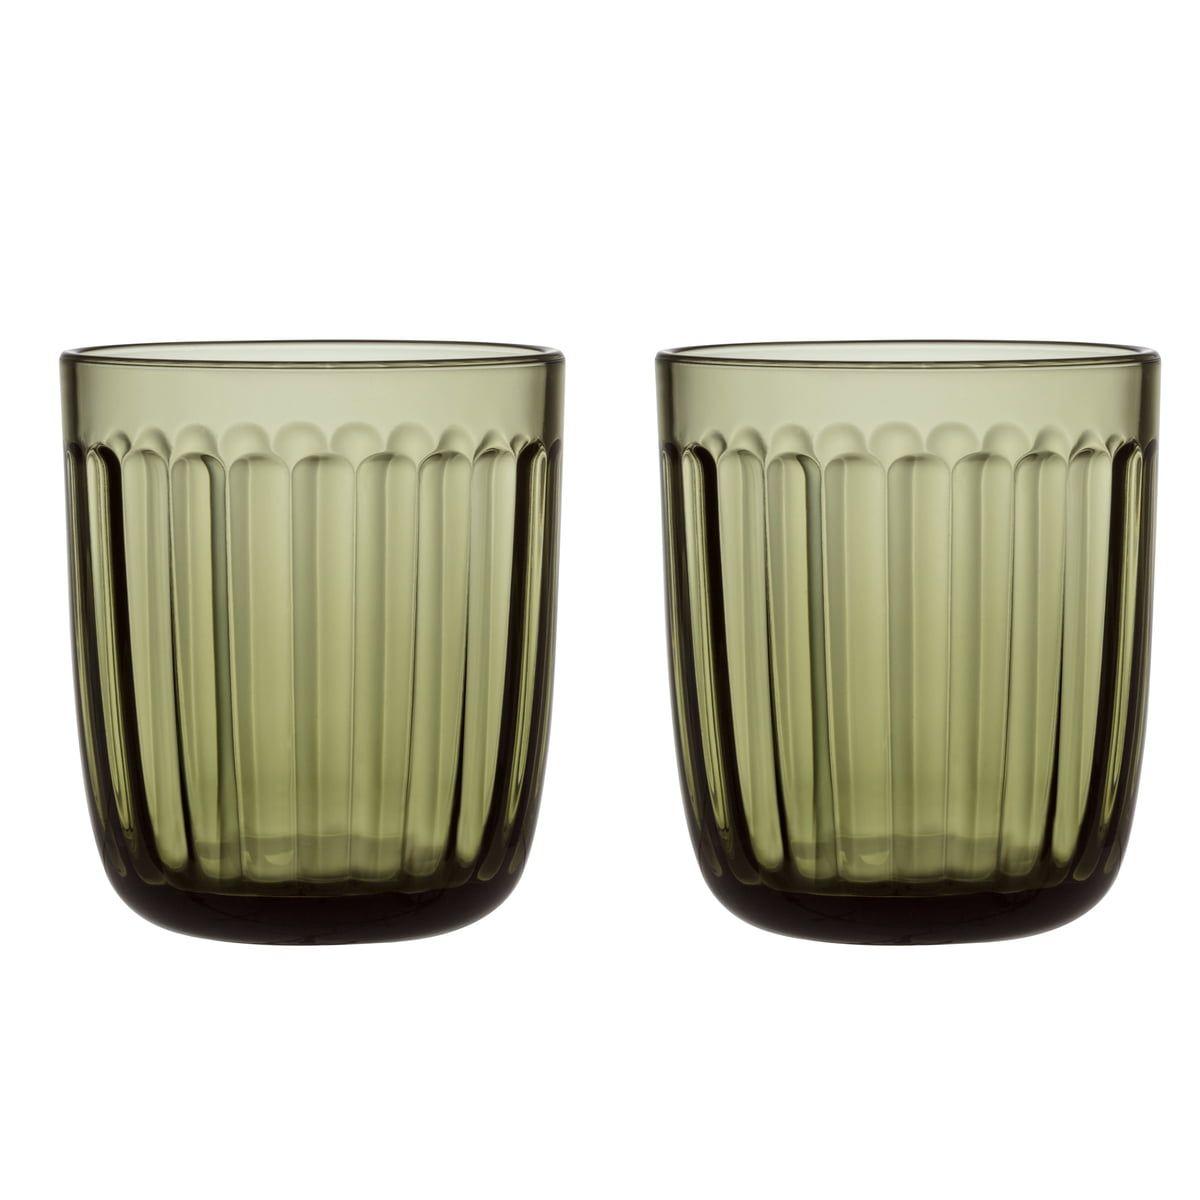 Iittala Raami Trinkglas 26 Cl Moosgrun 2er Set In 2020 Trinkglas Glas Und Geschirr